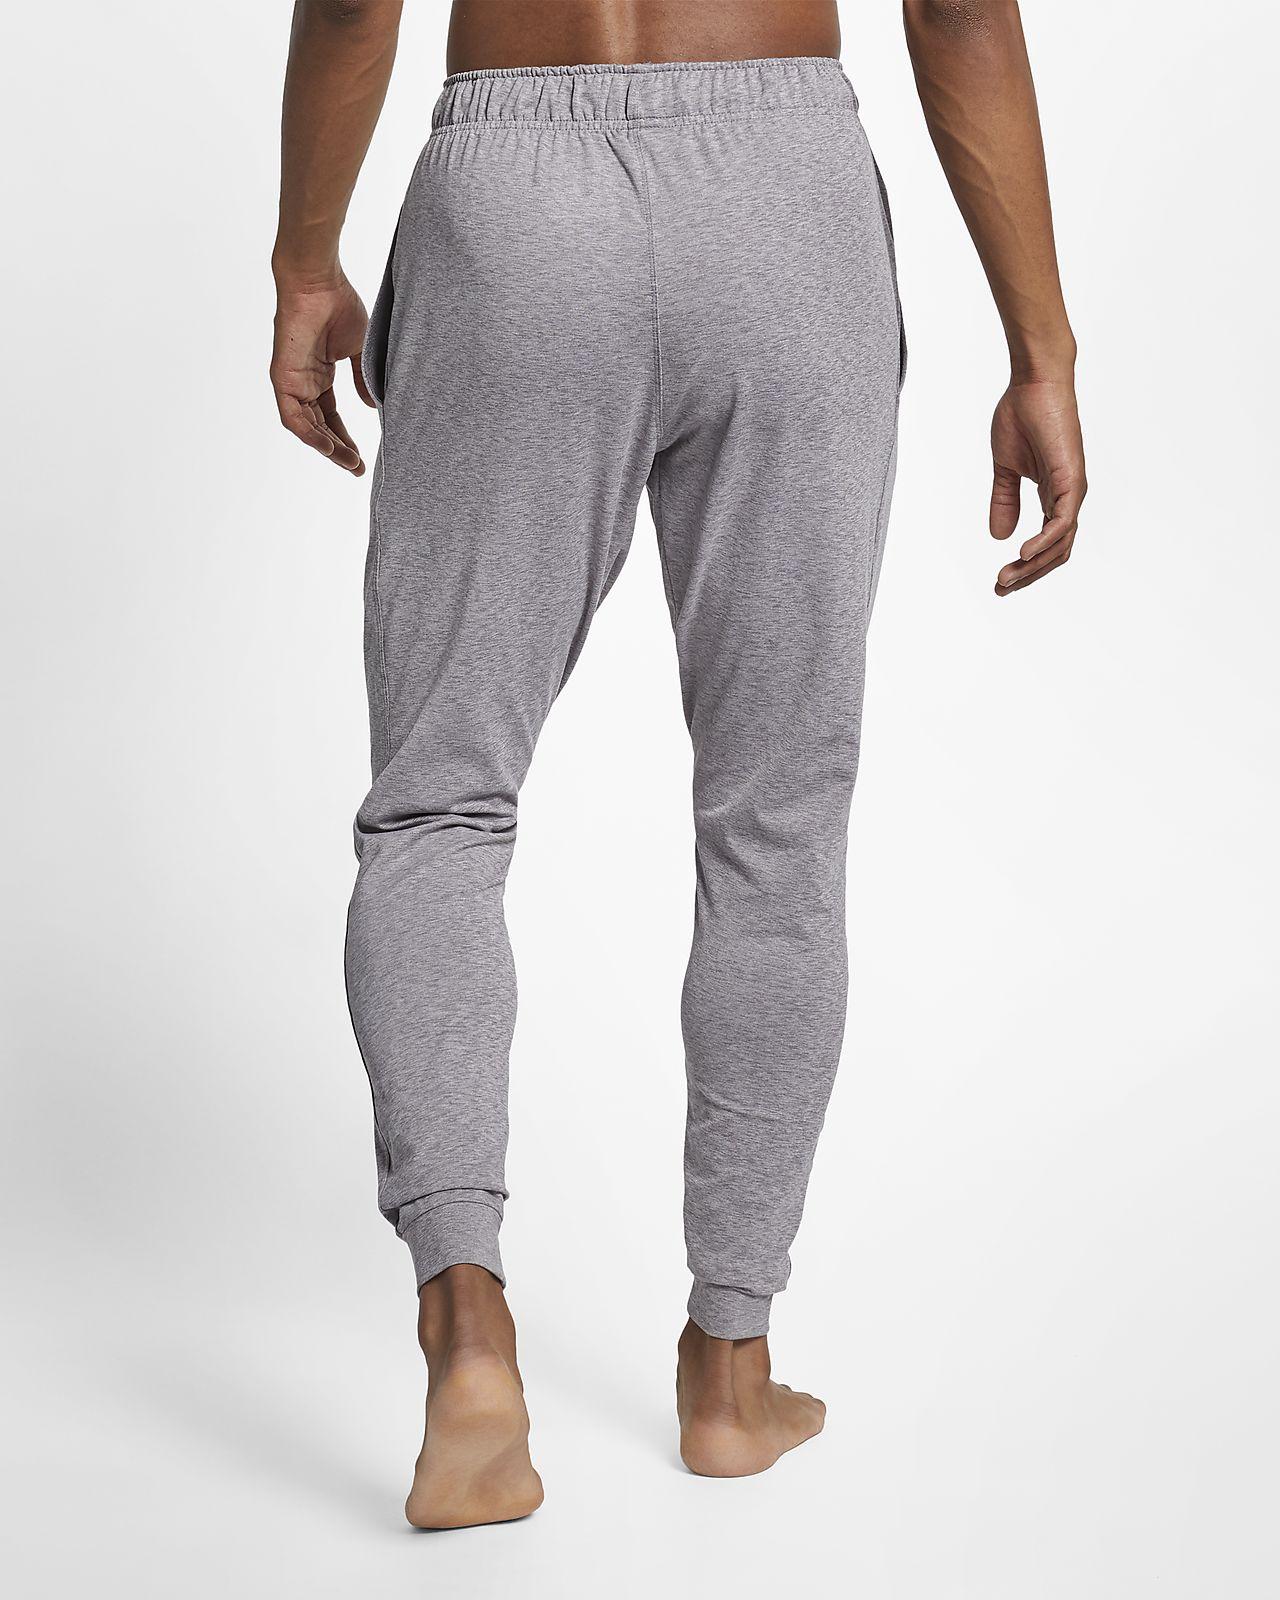 Pantalon de yoga Nike Dri FIT pour Homme